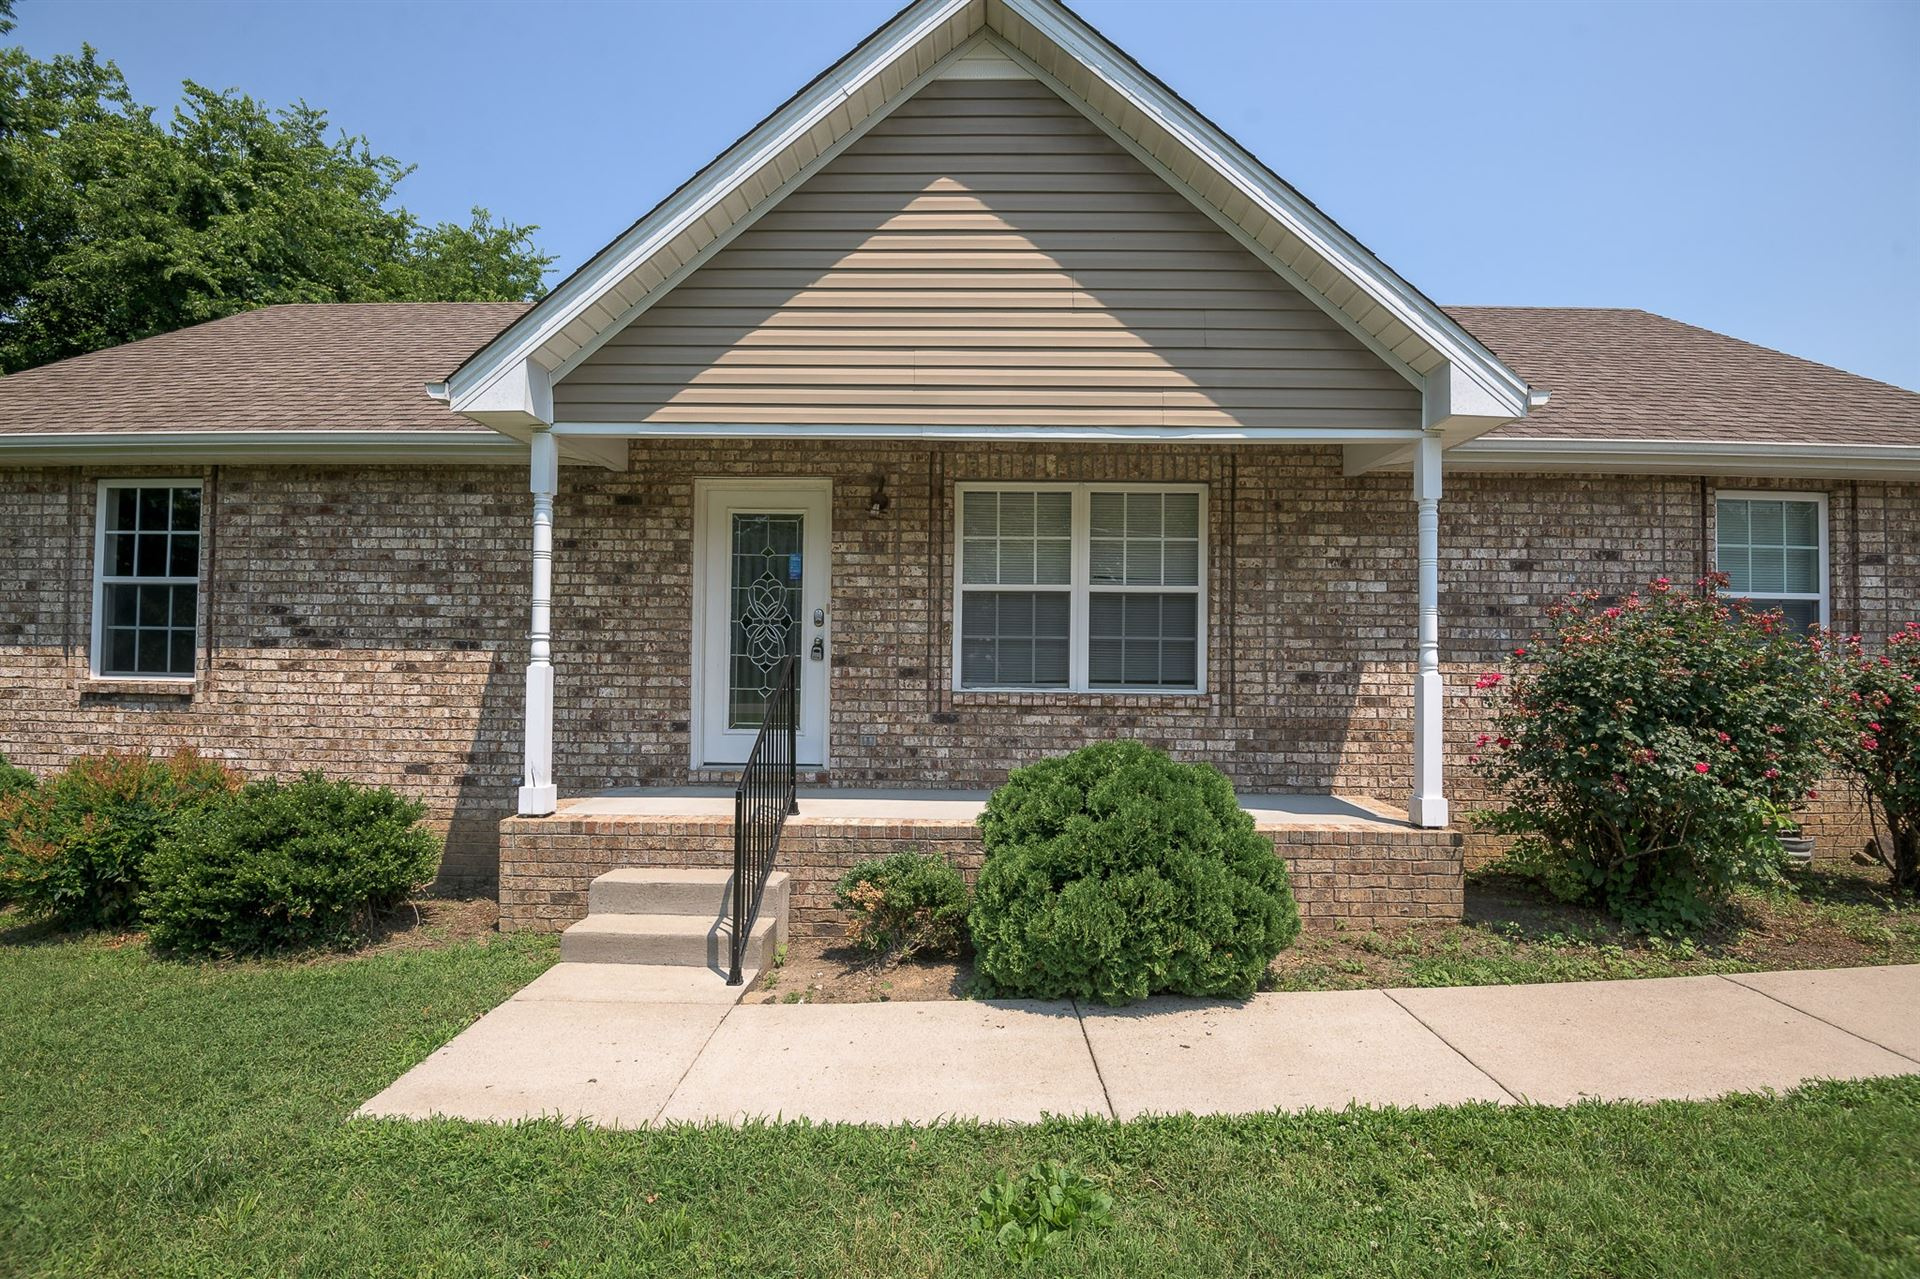 818 N Palmers Chapel Rd, White House, TN 37188 - MLS#: 2269049